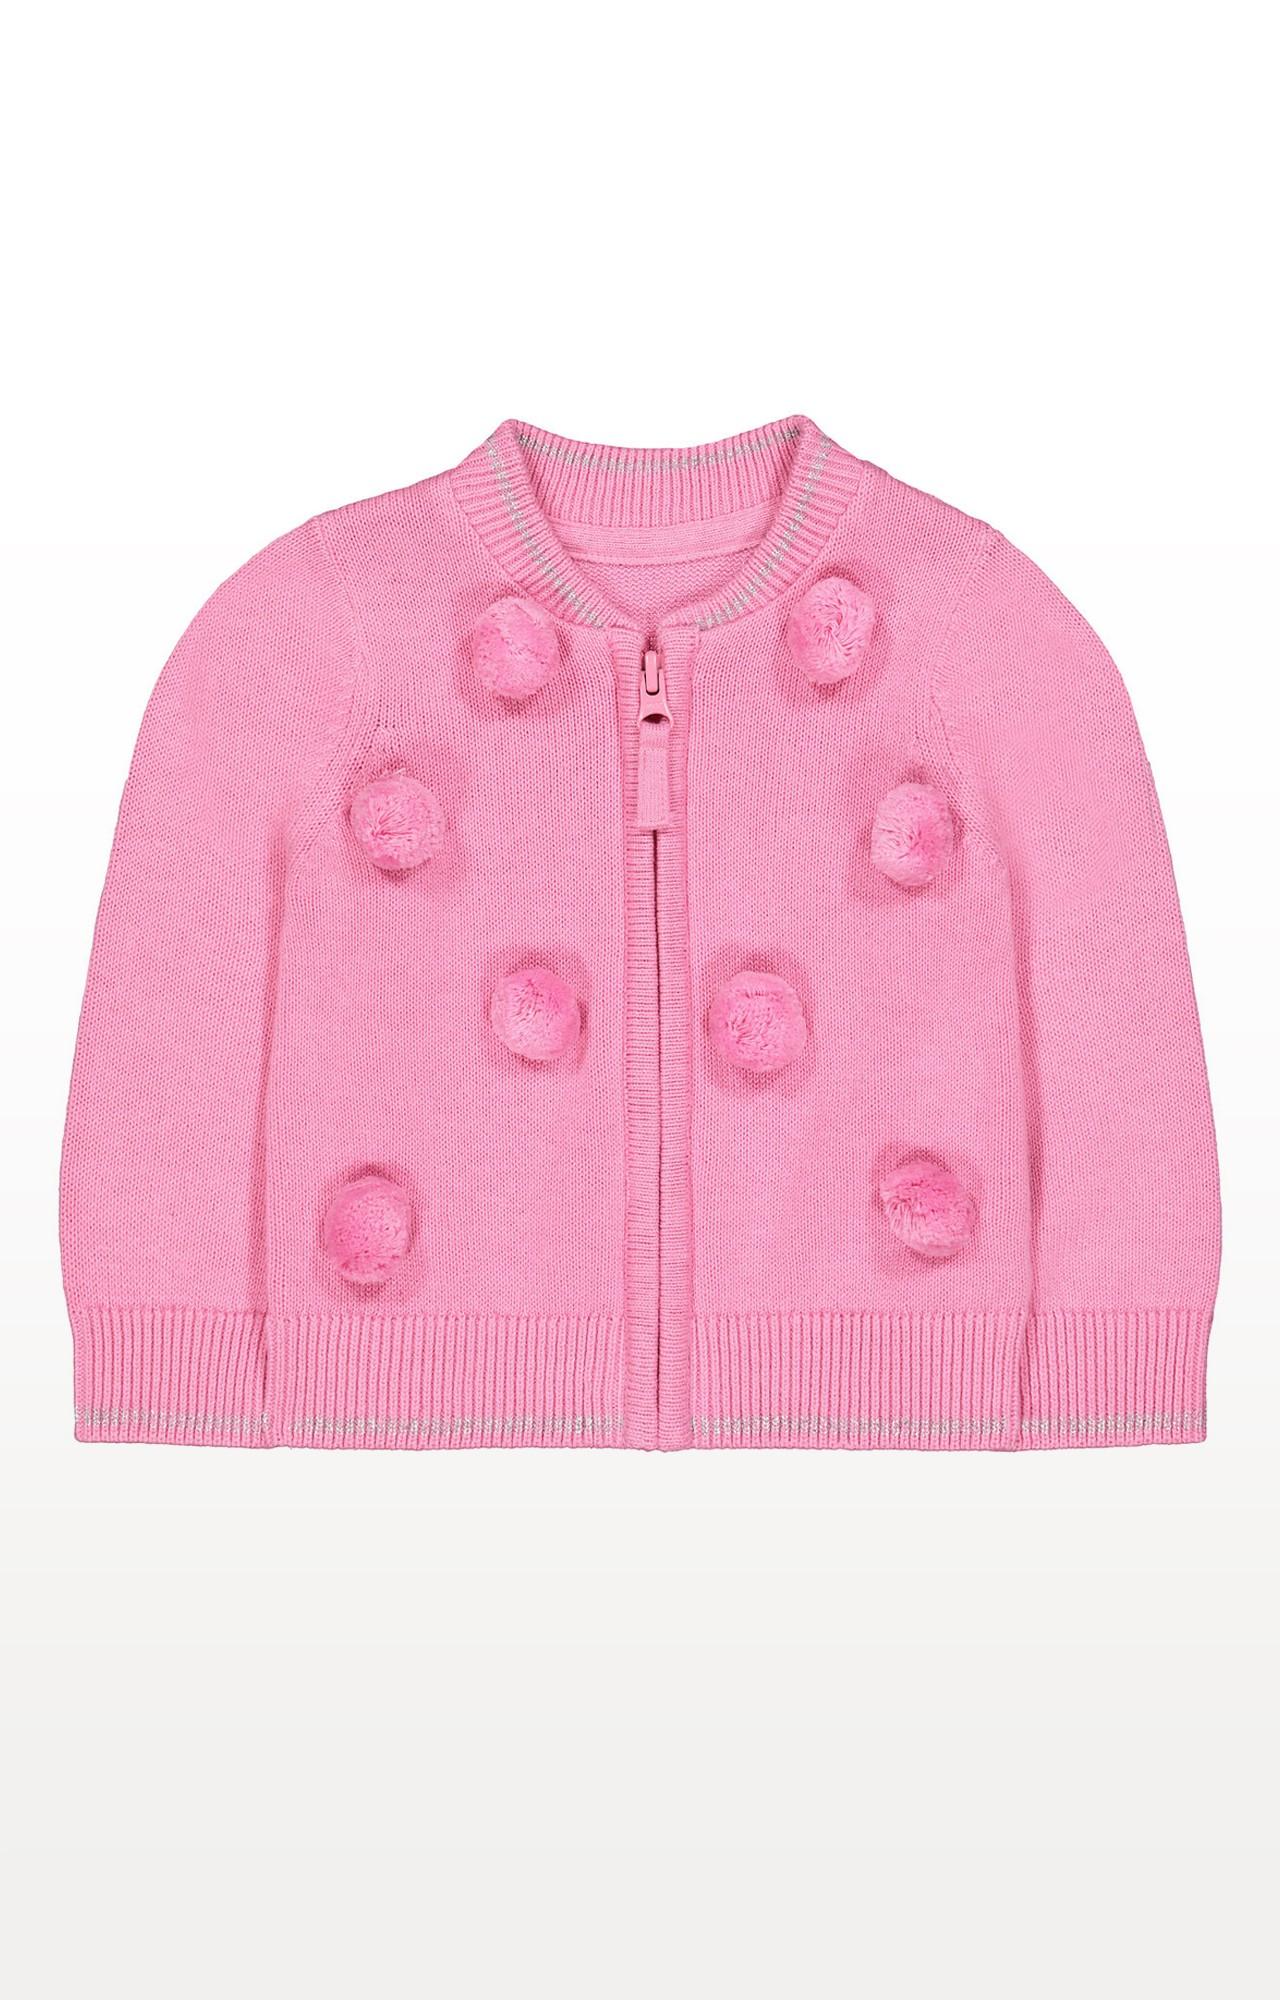 Mothercare | Pink Solid Sweatshirt